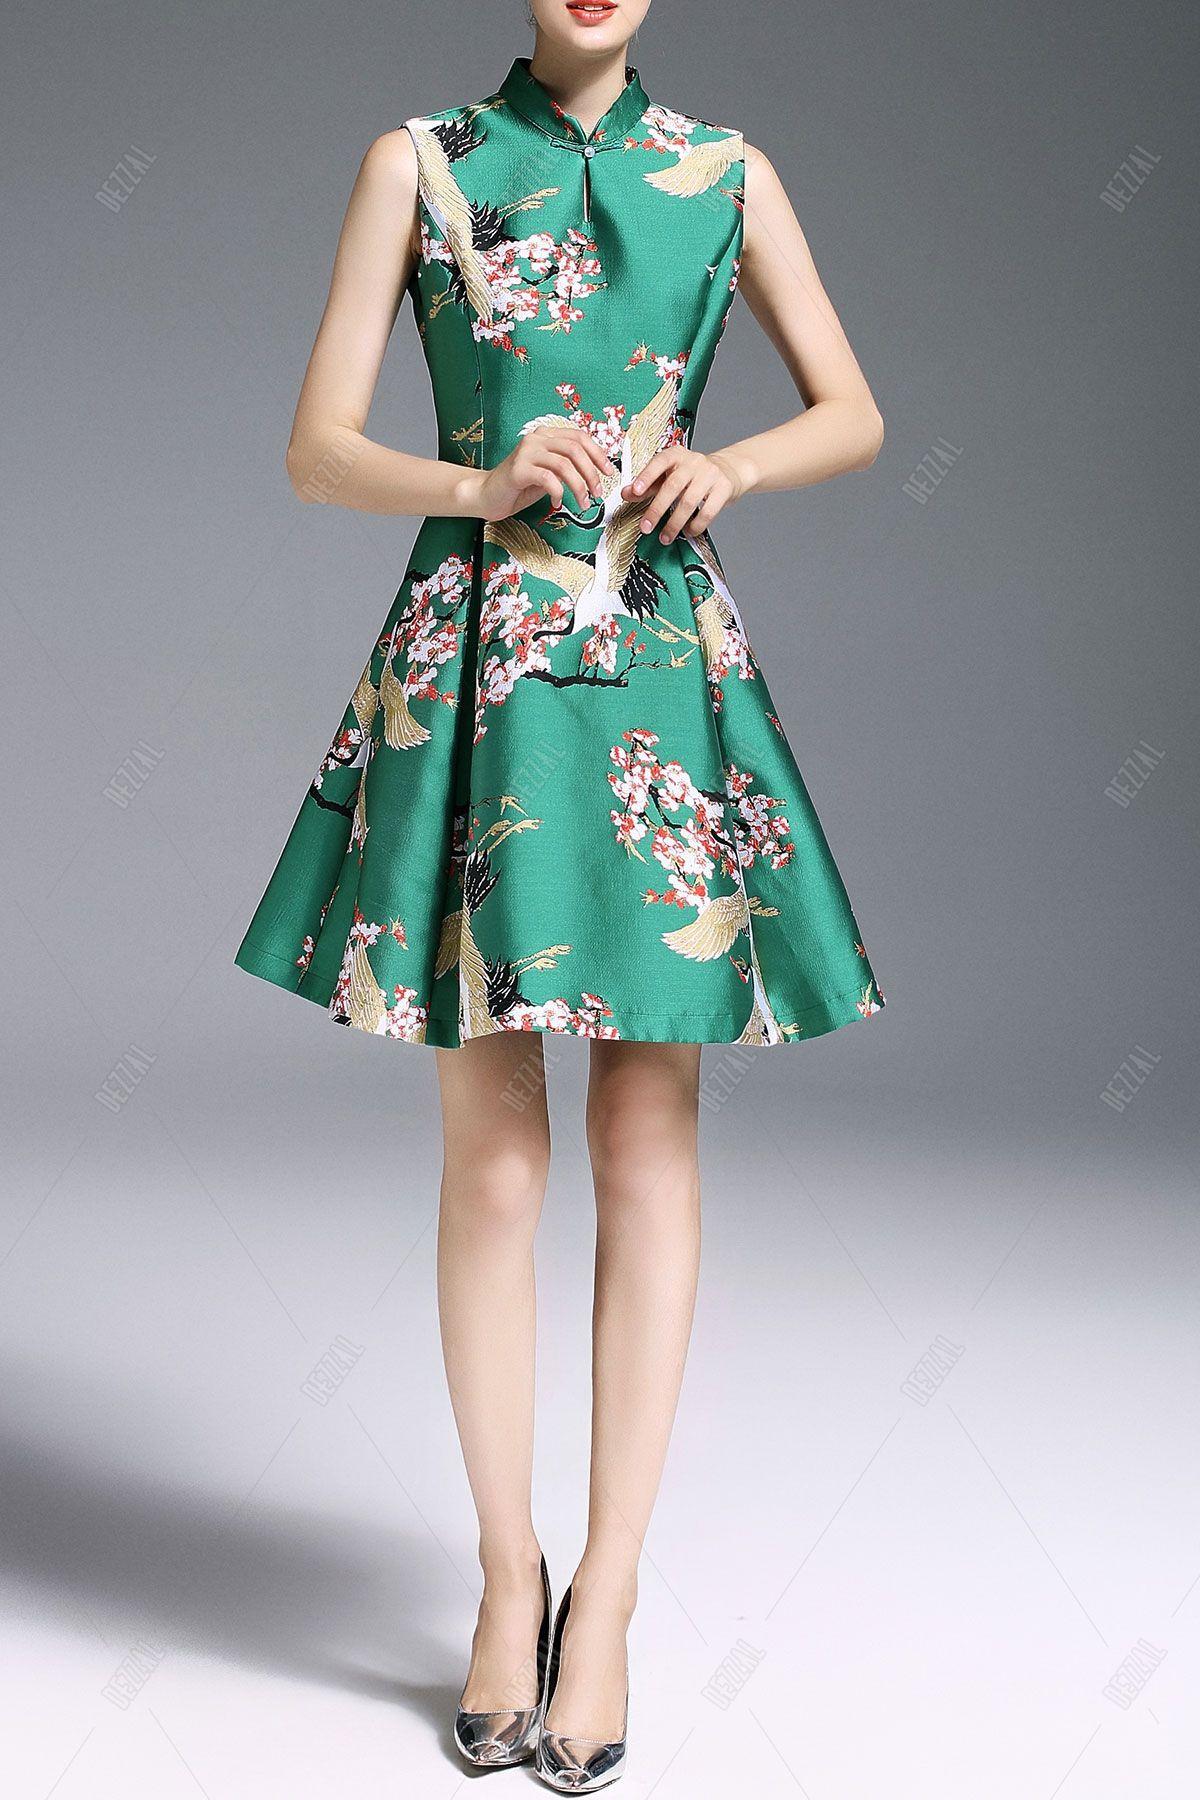 Mandarin collar flannel  Mandarin Collar Print A Line Dress  My Style  Pinterest  Mandarin